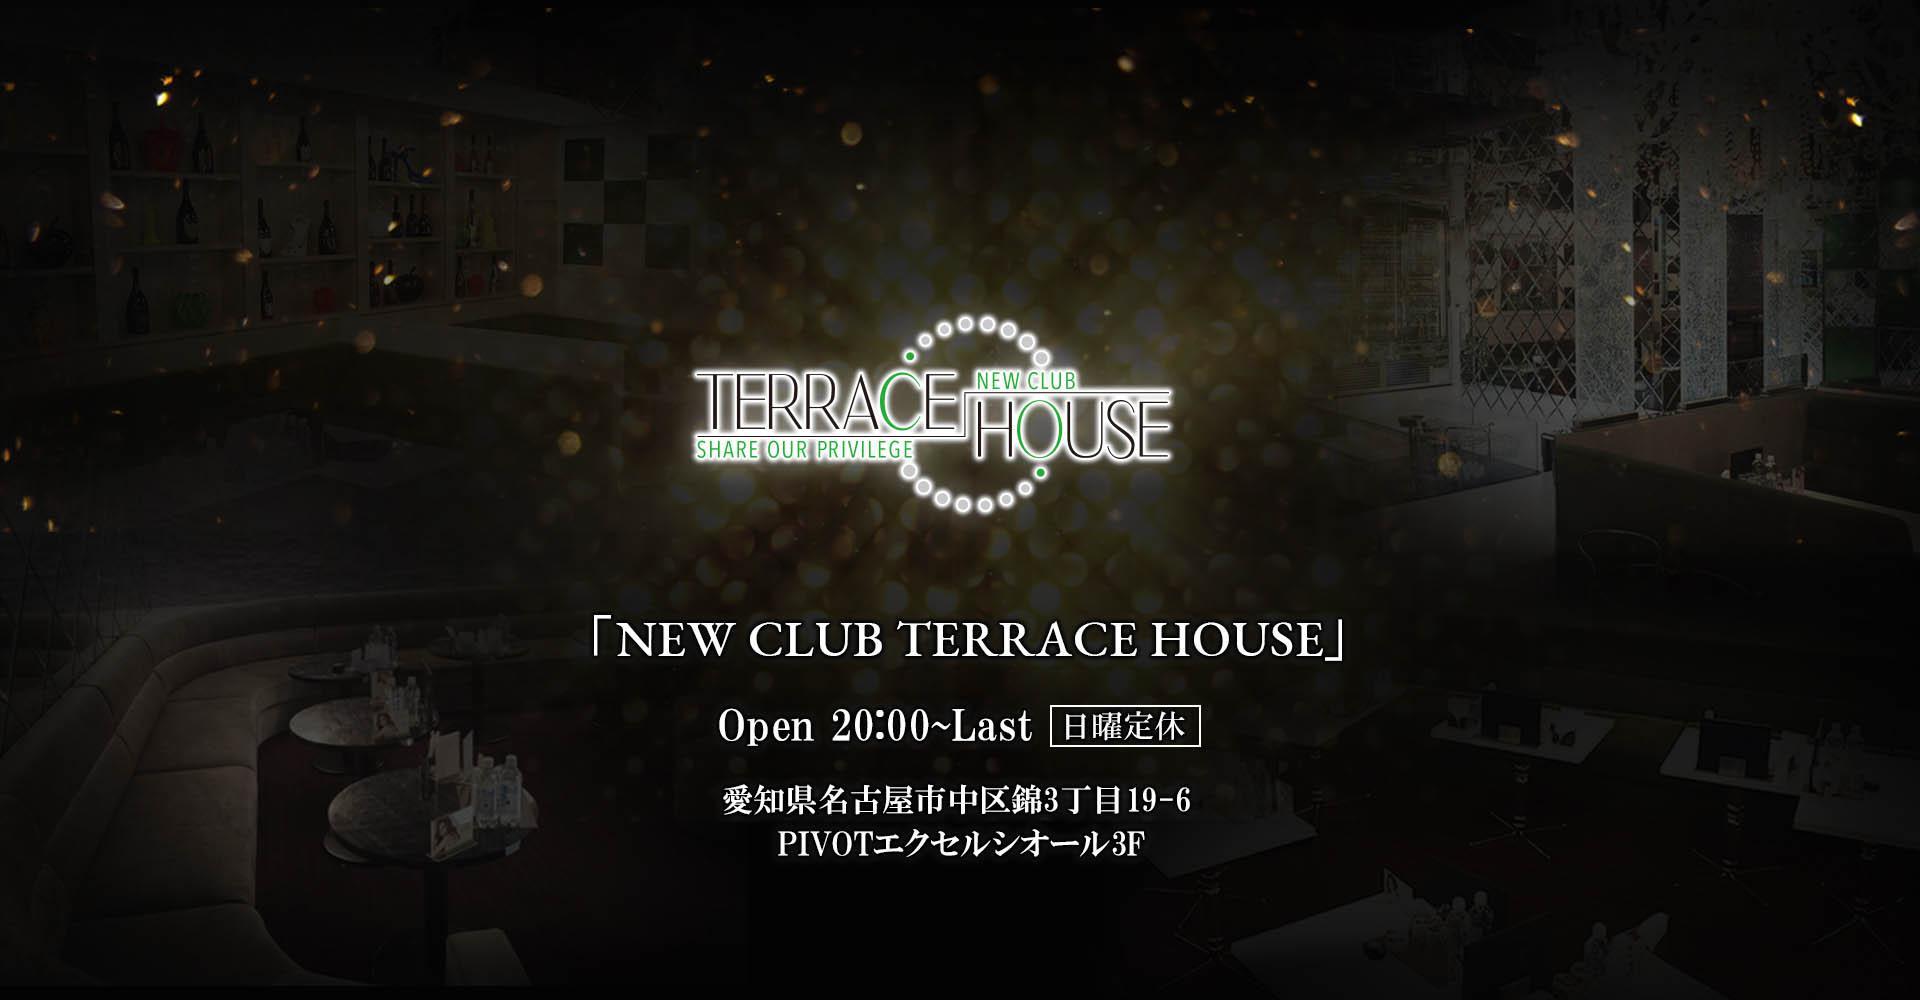 NEW CLUB TERRACE HOUSE